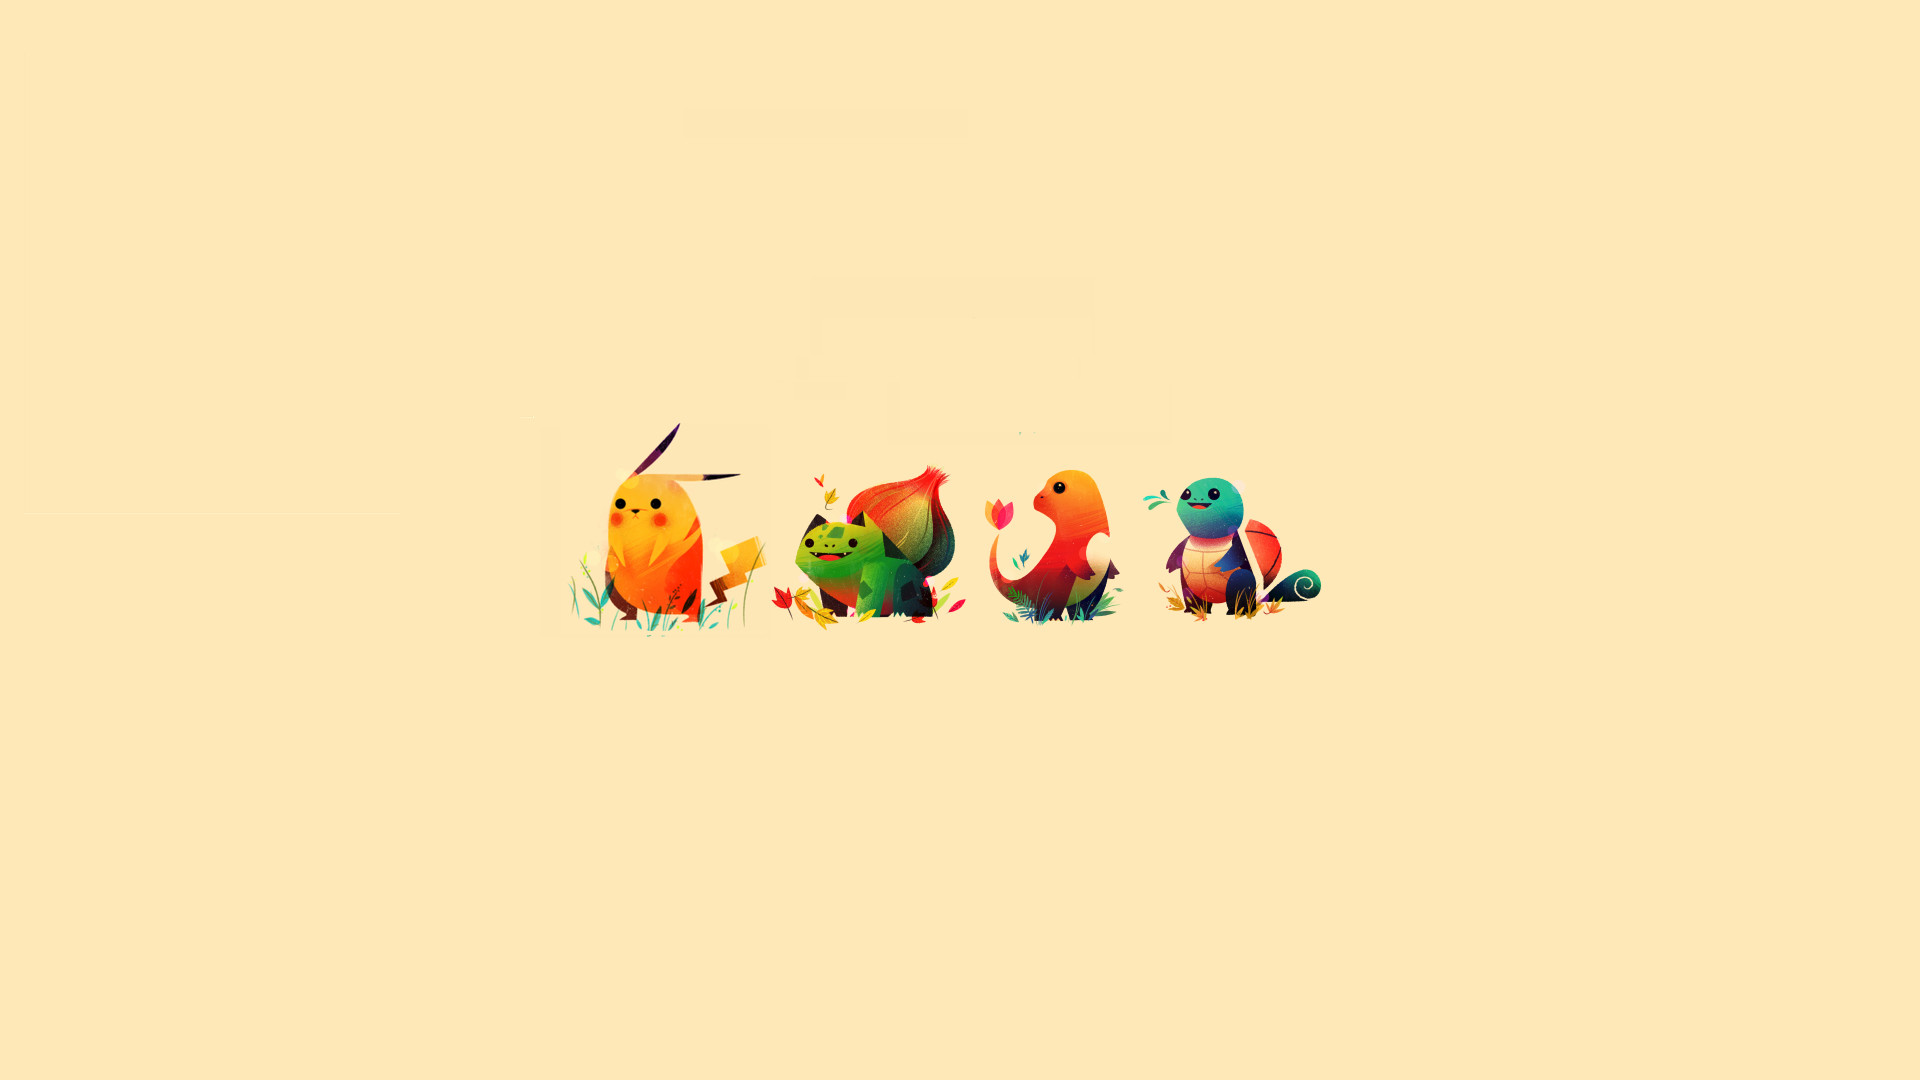 Pokemon Wallpapers 2560×1440 Group (74+)